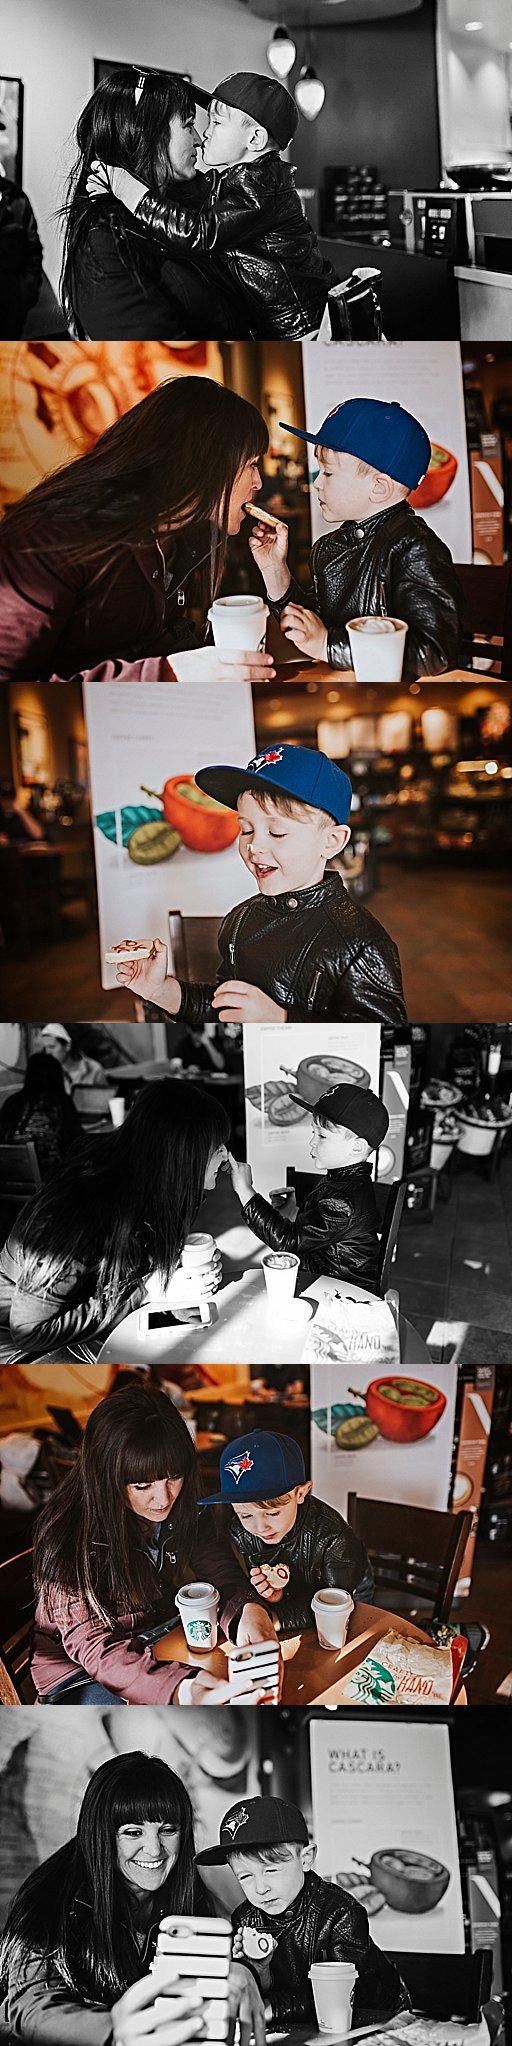 Lethbridge Family Photographer13